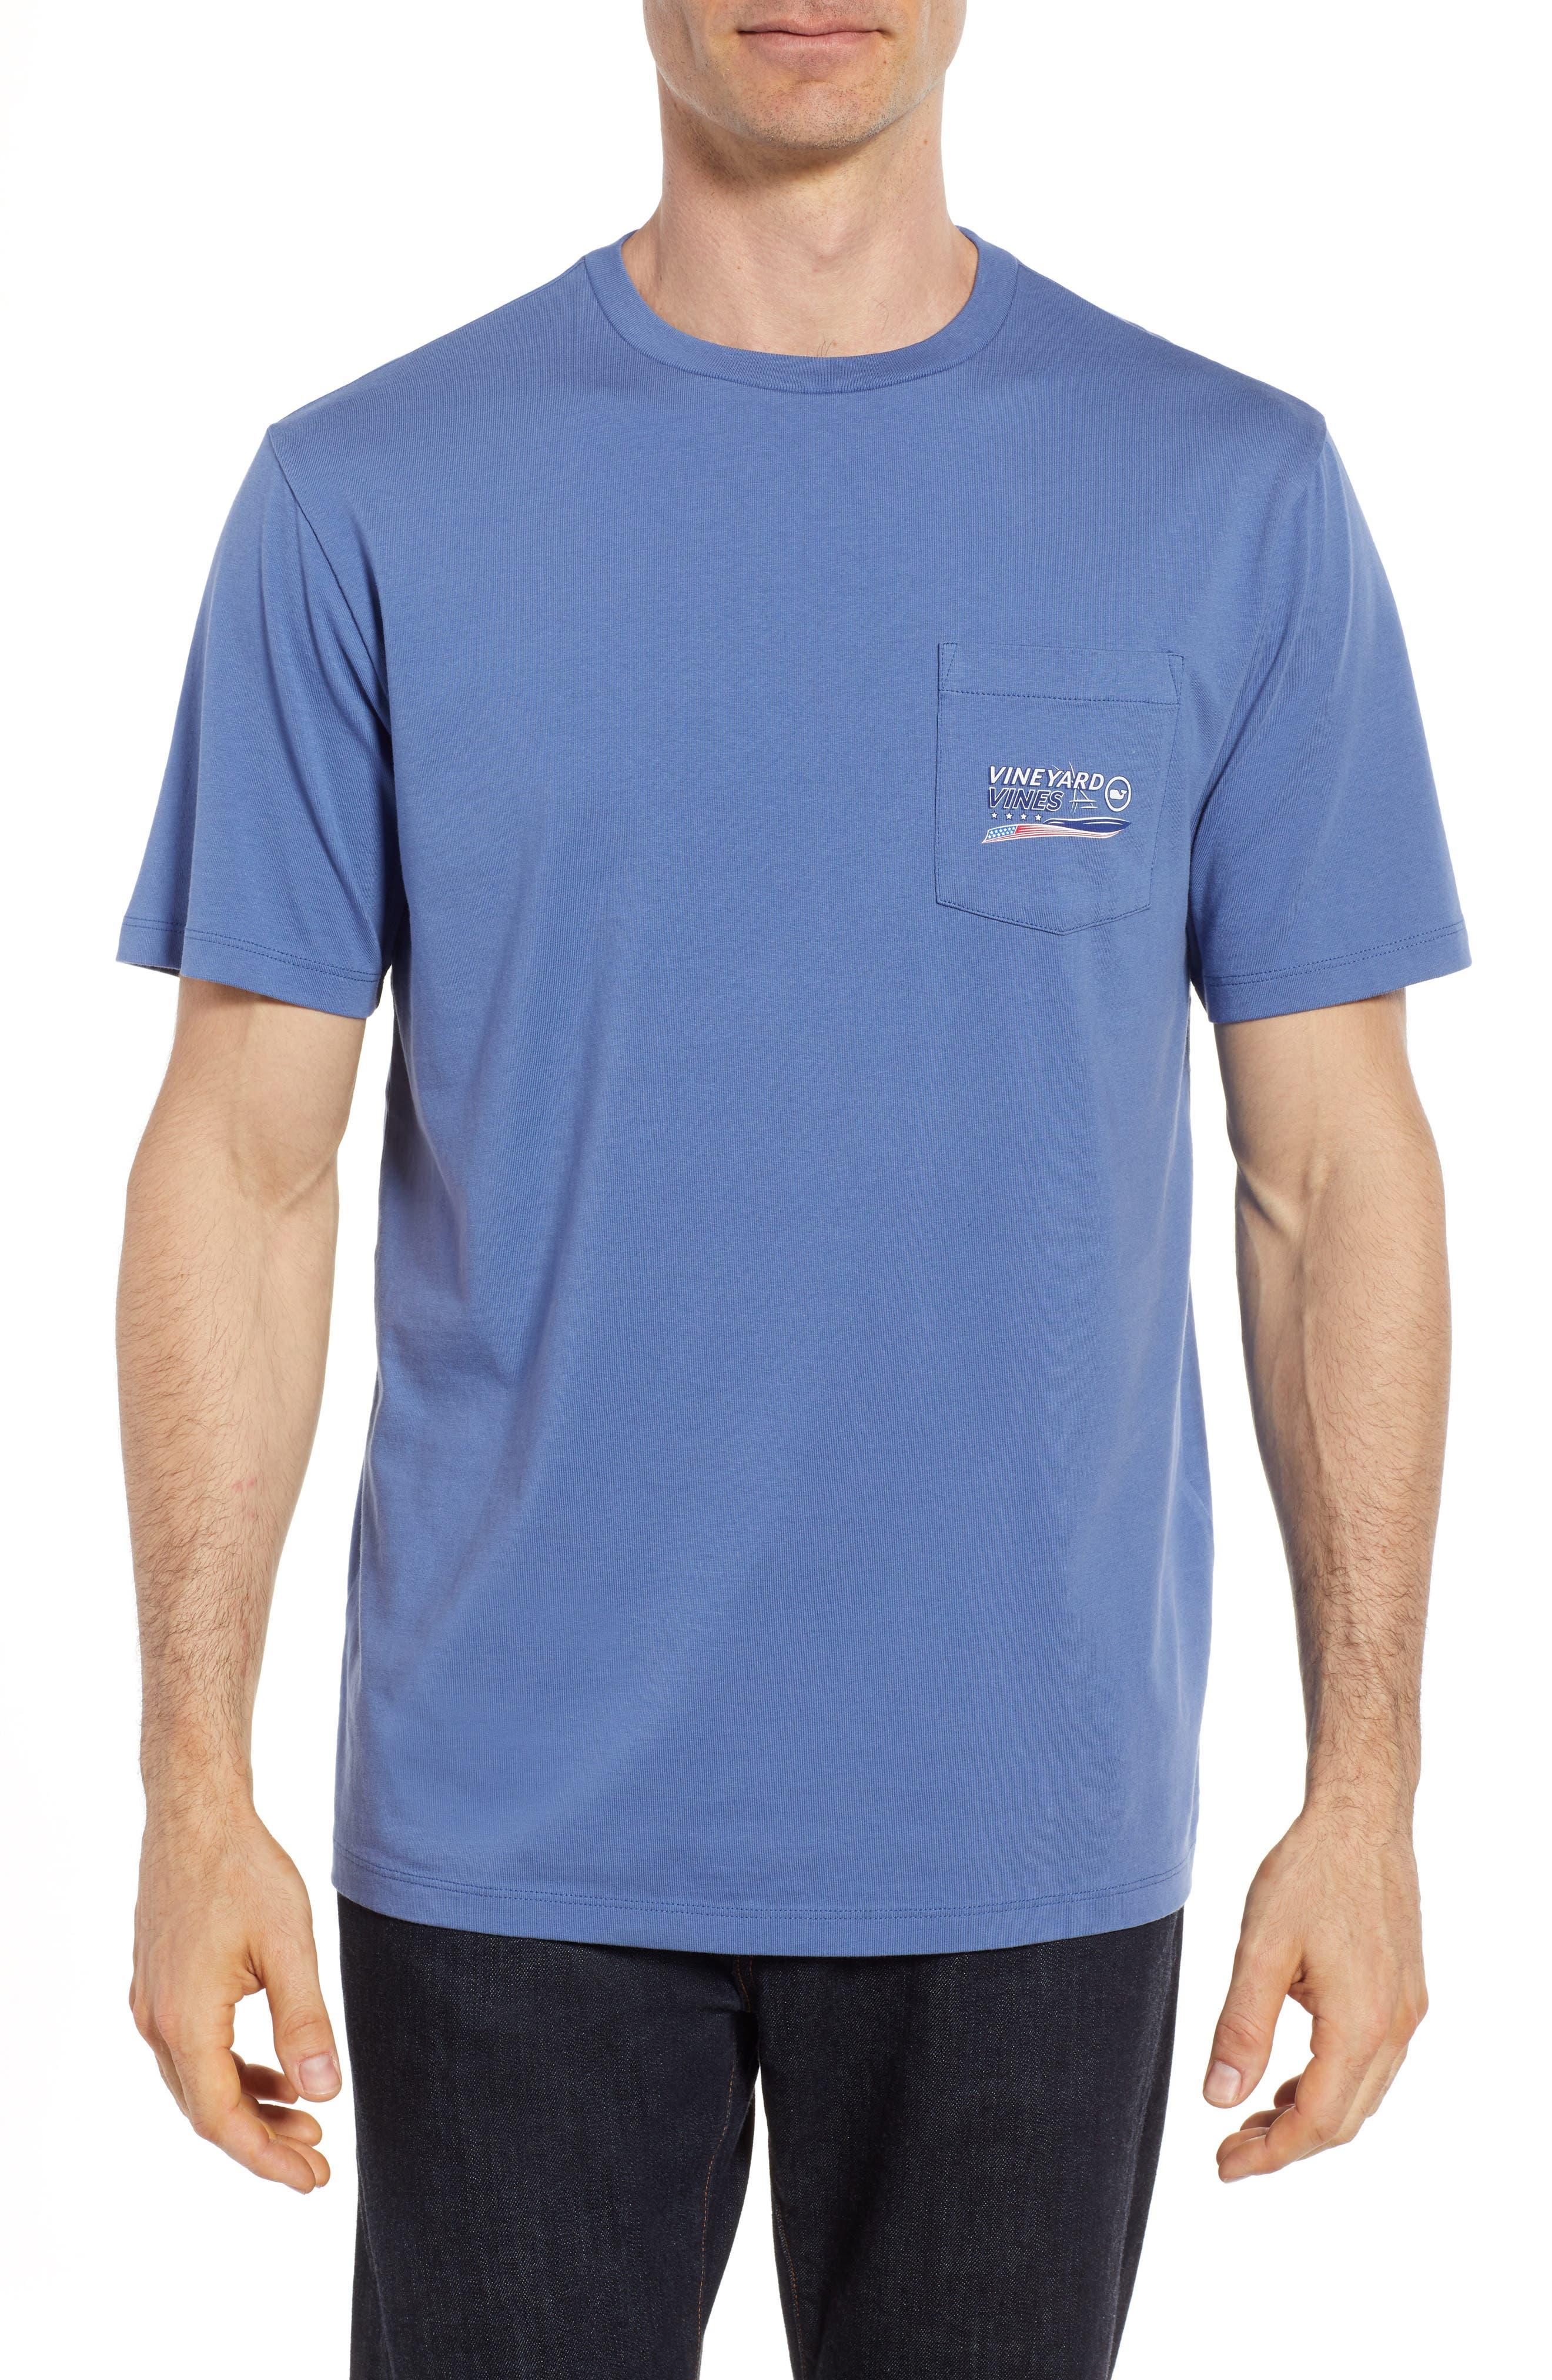 American Sportfisher T-Shirt,                         Main,                         color, Moonshine